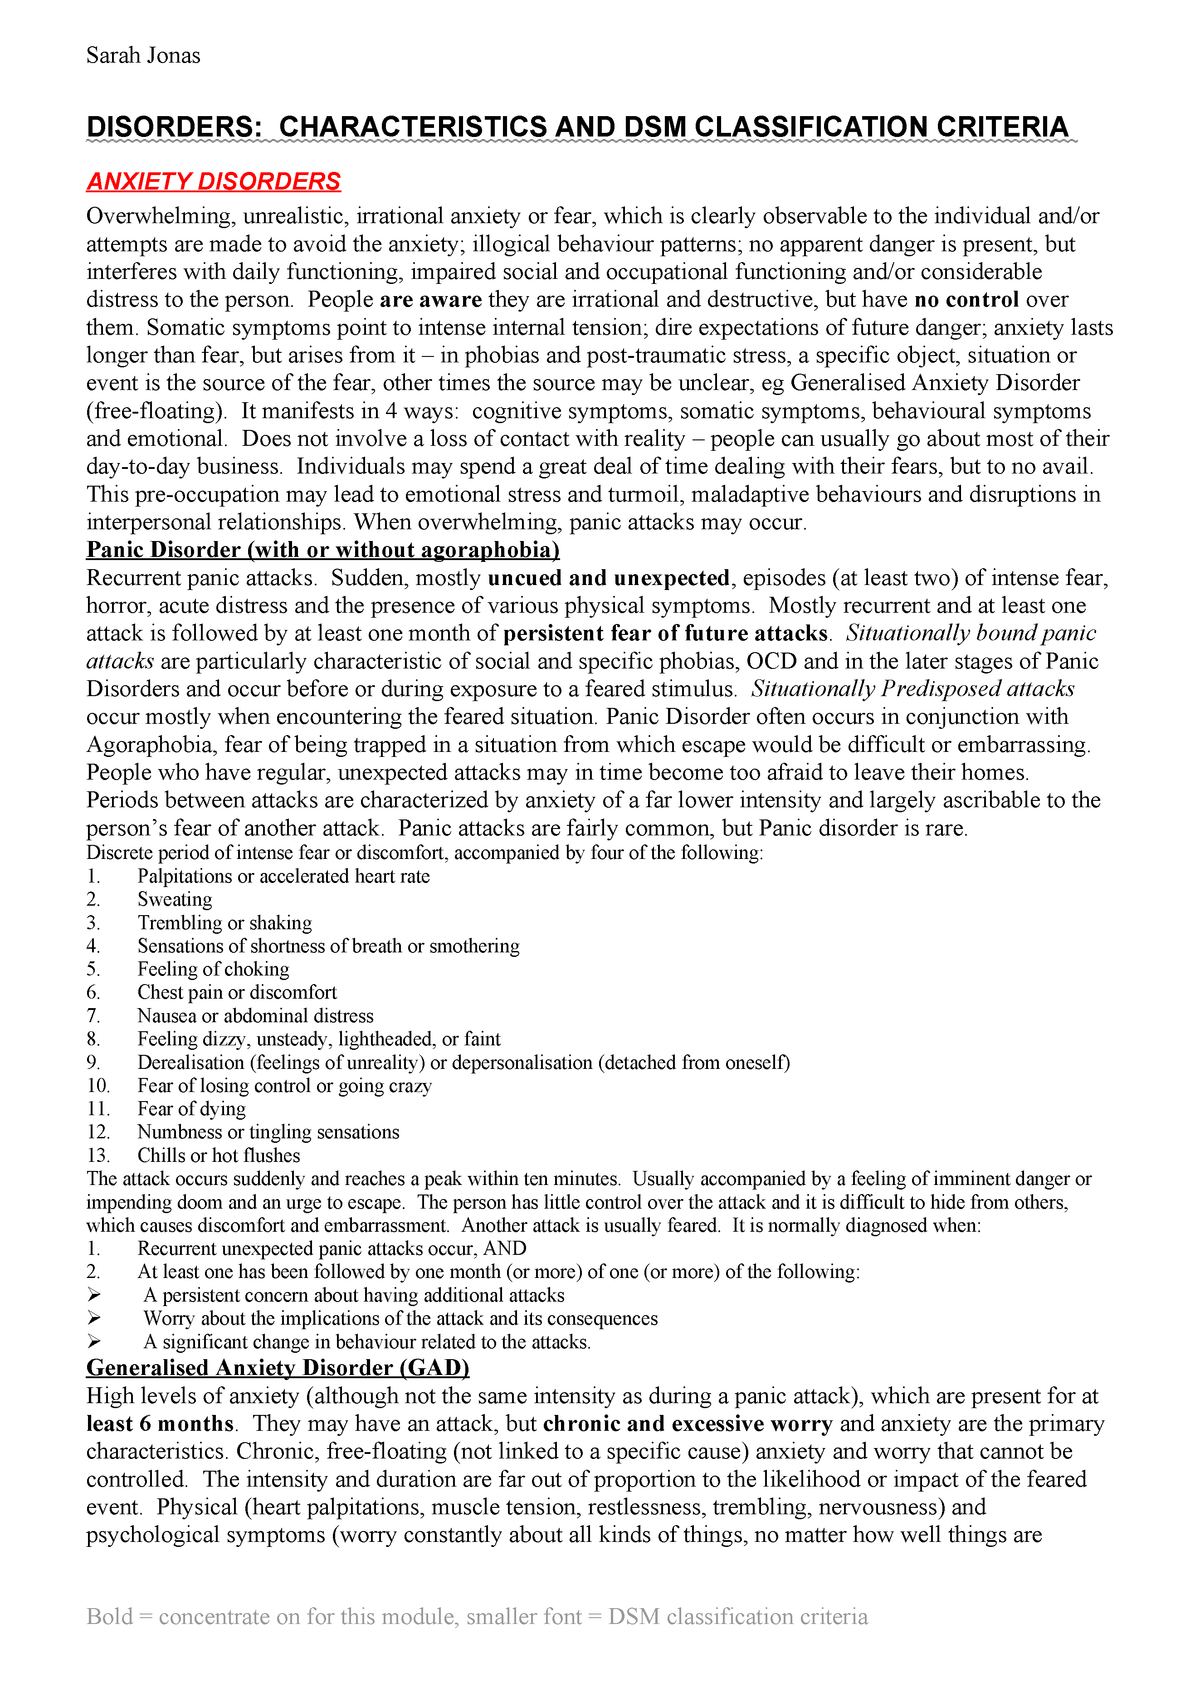 PYC3702 DSM DISORDERS - Abnormal Behaviour And Mental Health